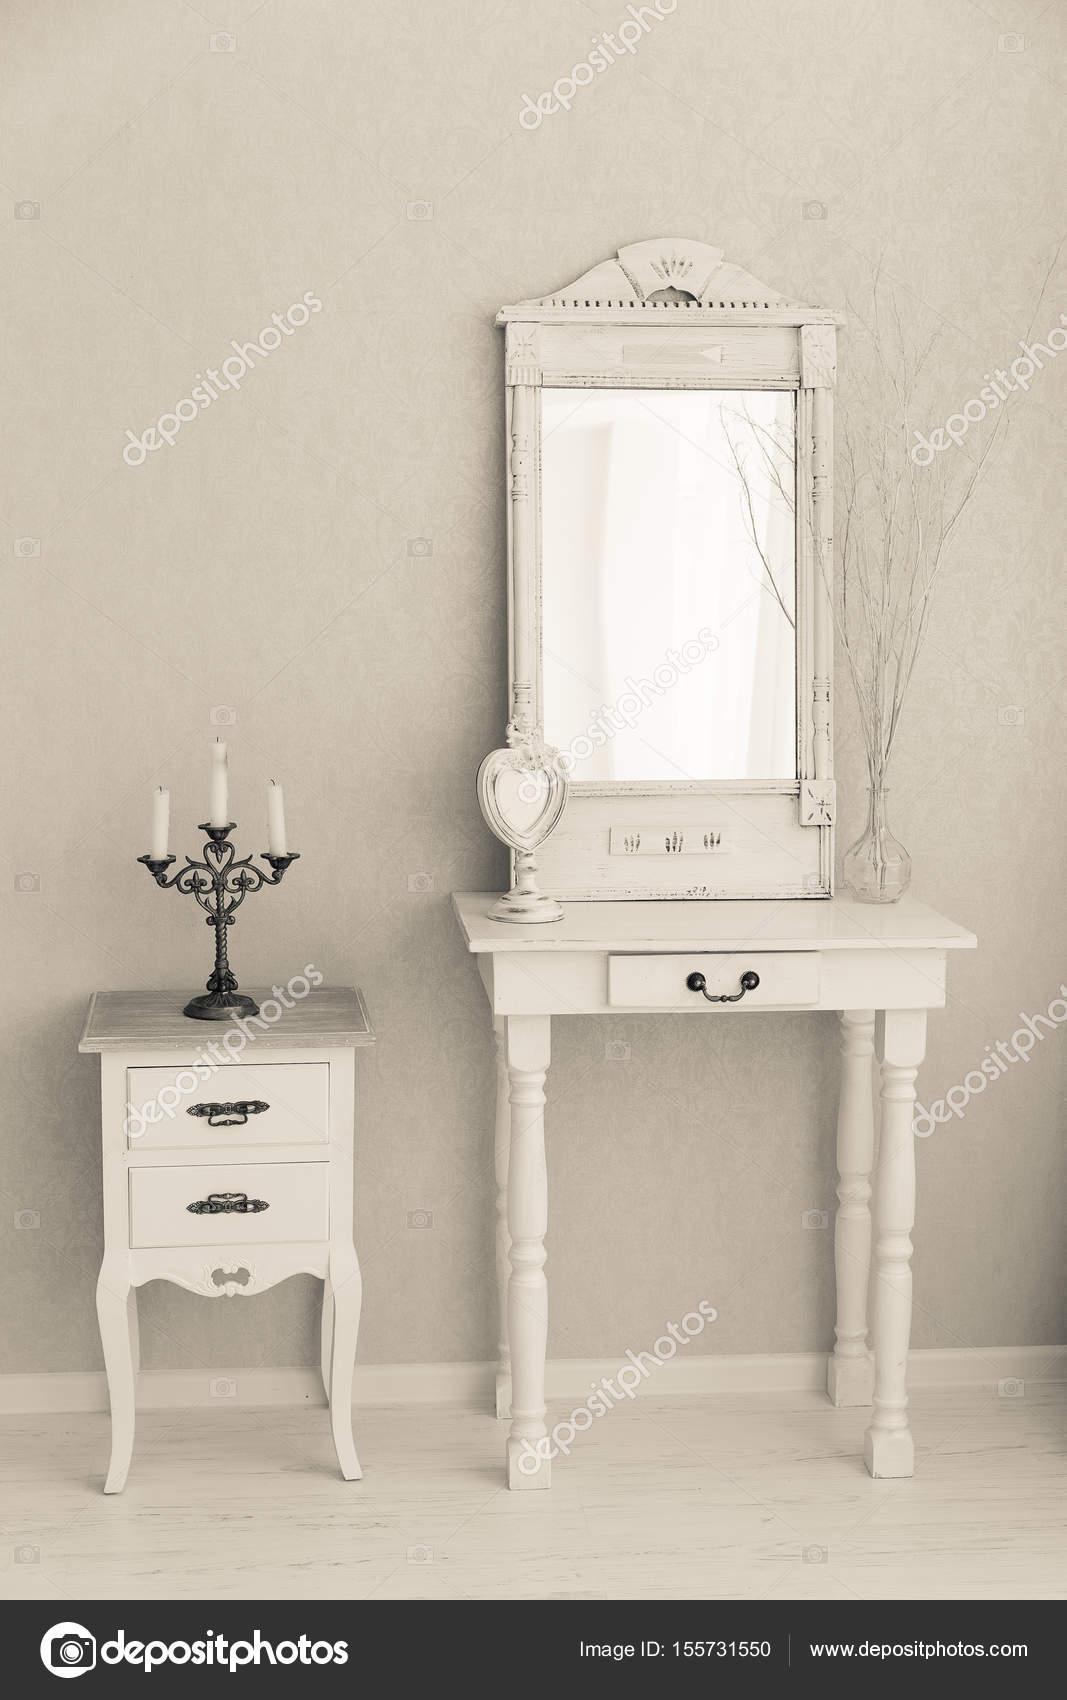 Vieja Retro Blanco Tocador Espejo De Cristal Fotos De Stock